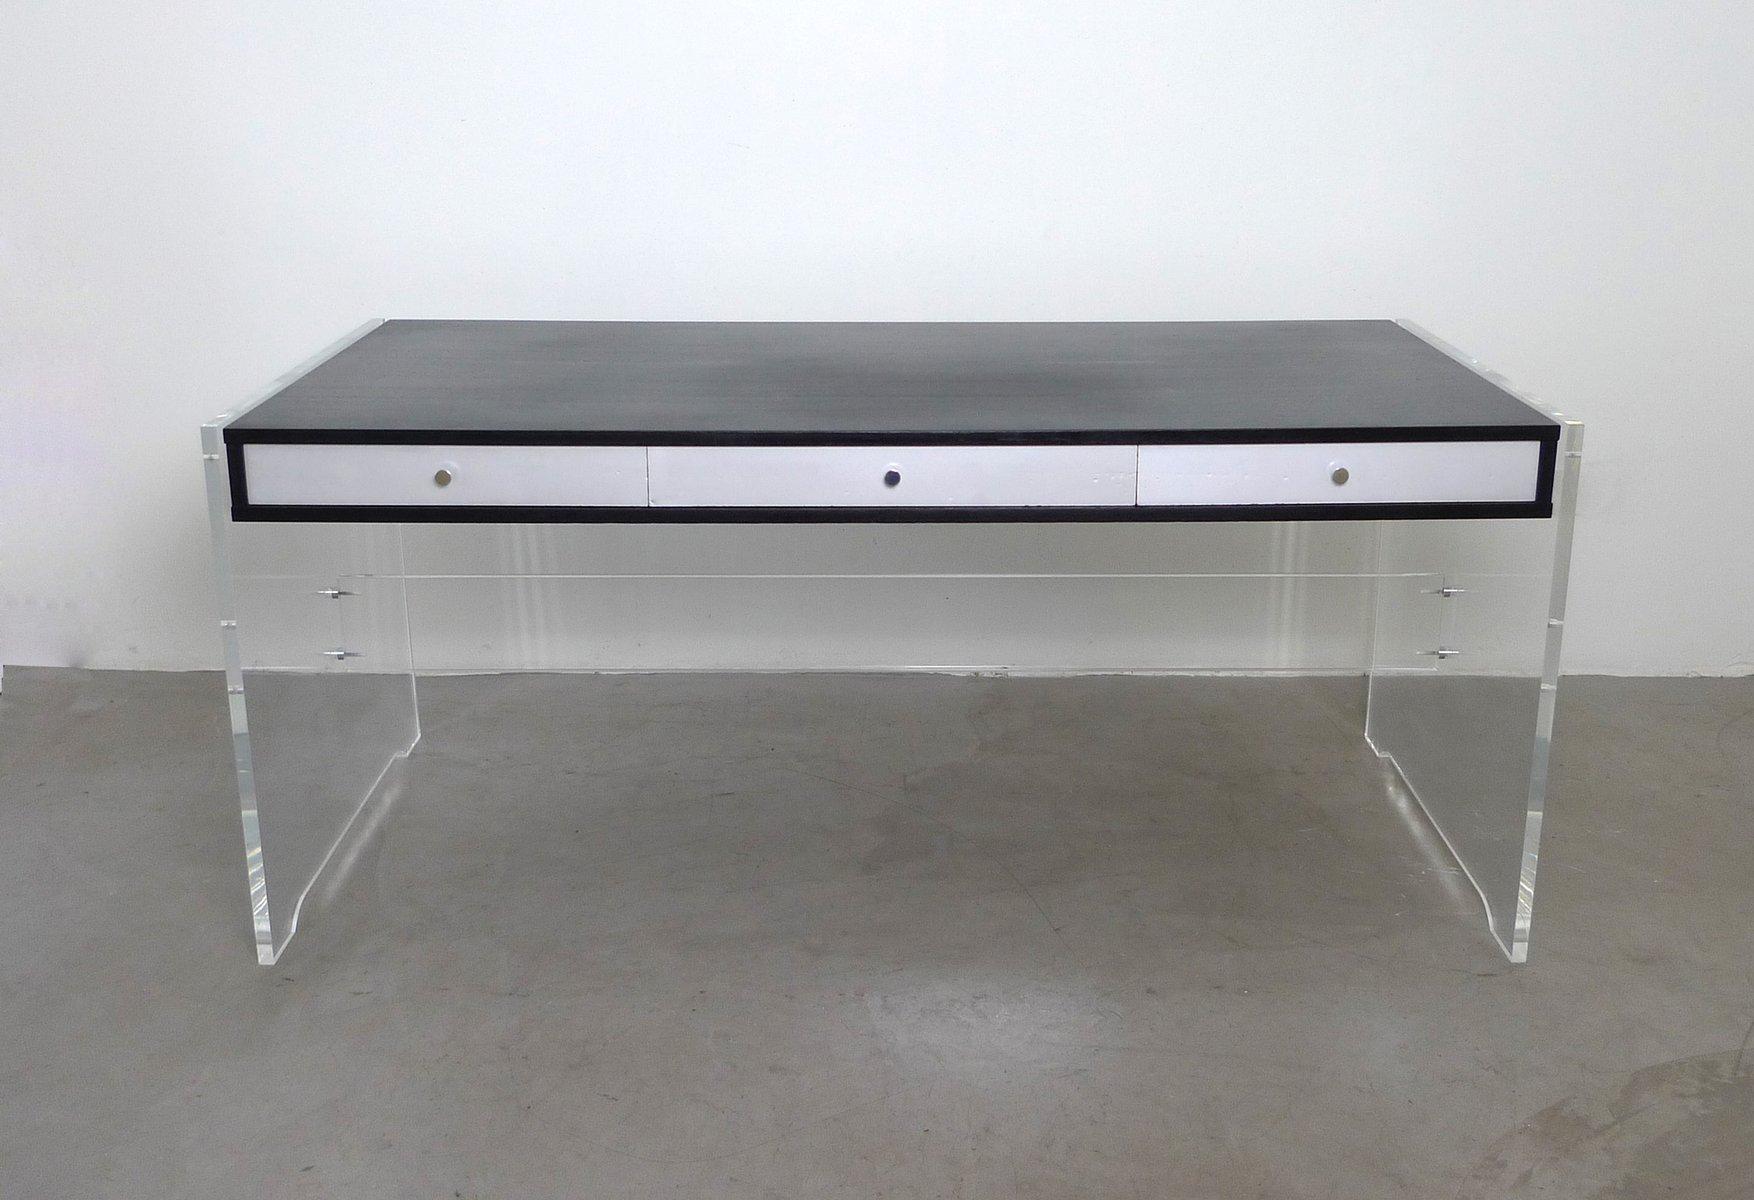 GP 160 Desk By Poul Norreklit For Georg Petersen, 1970